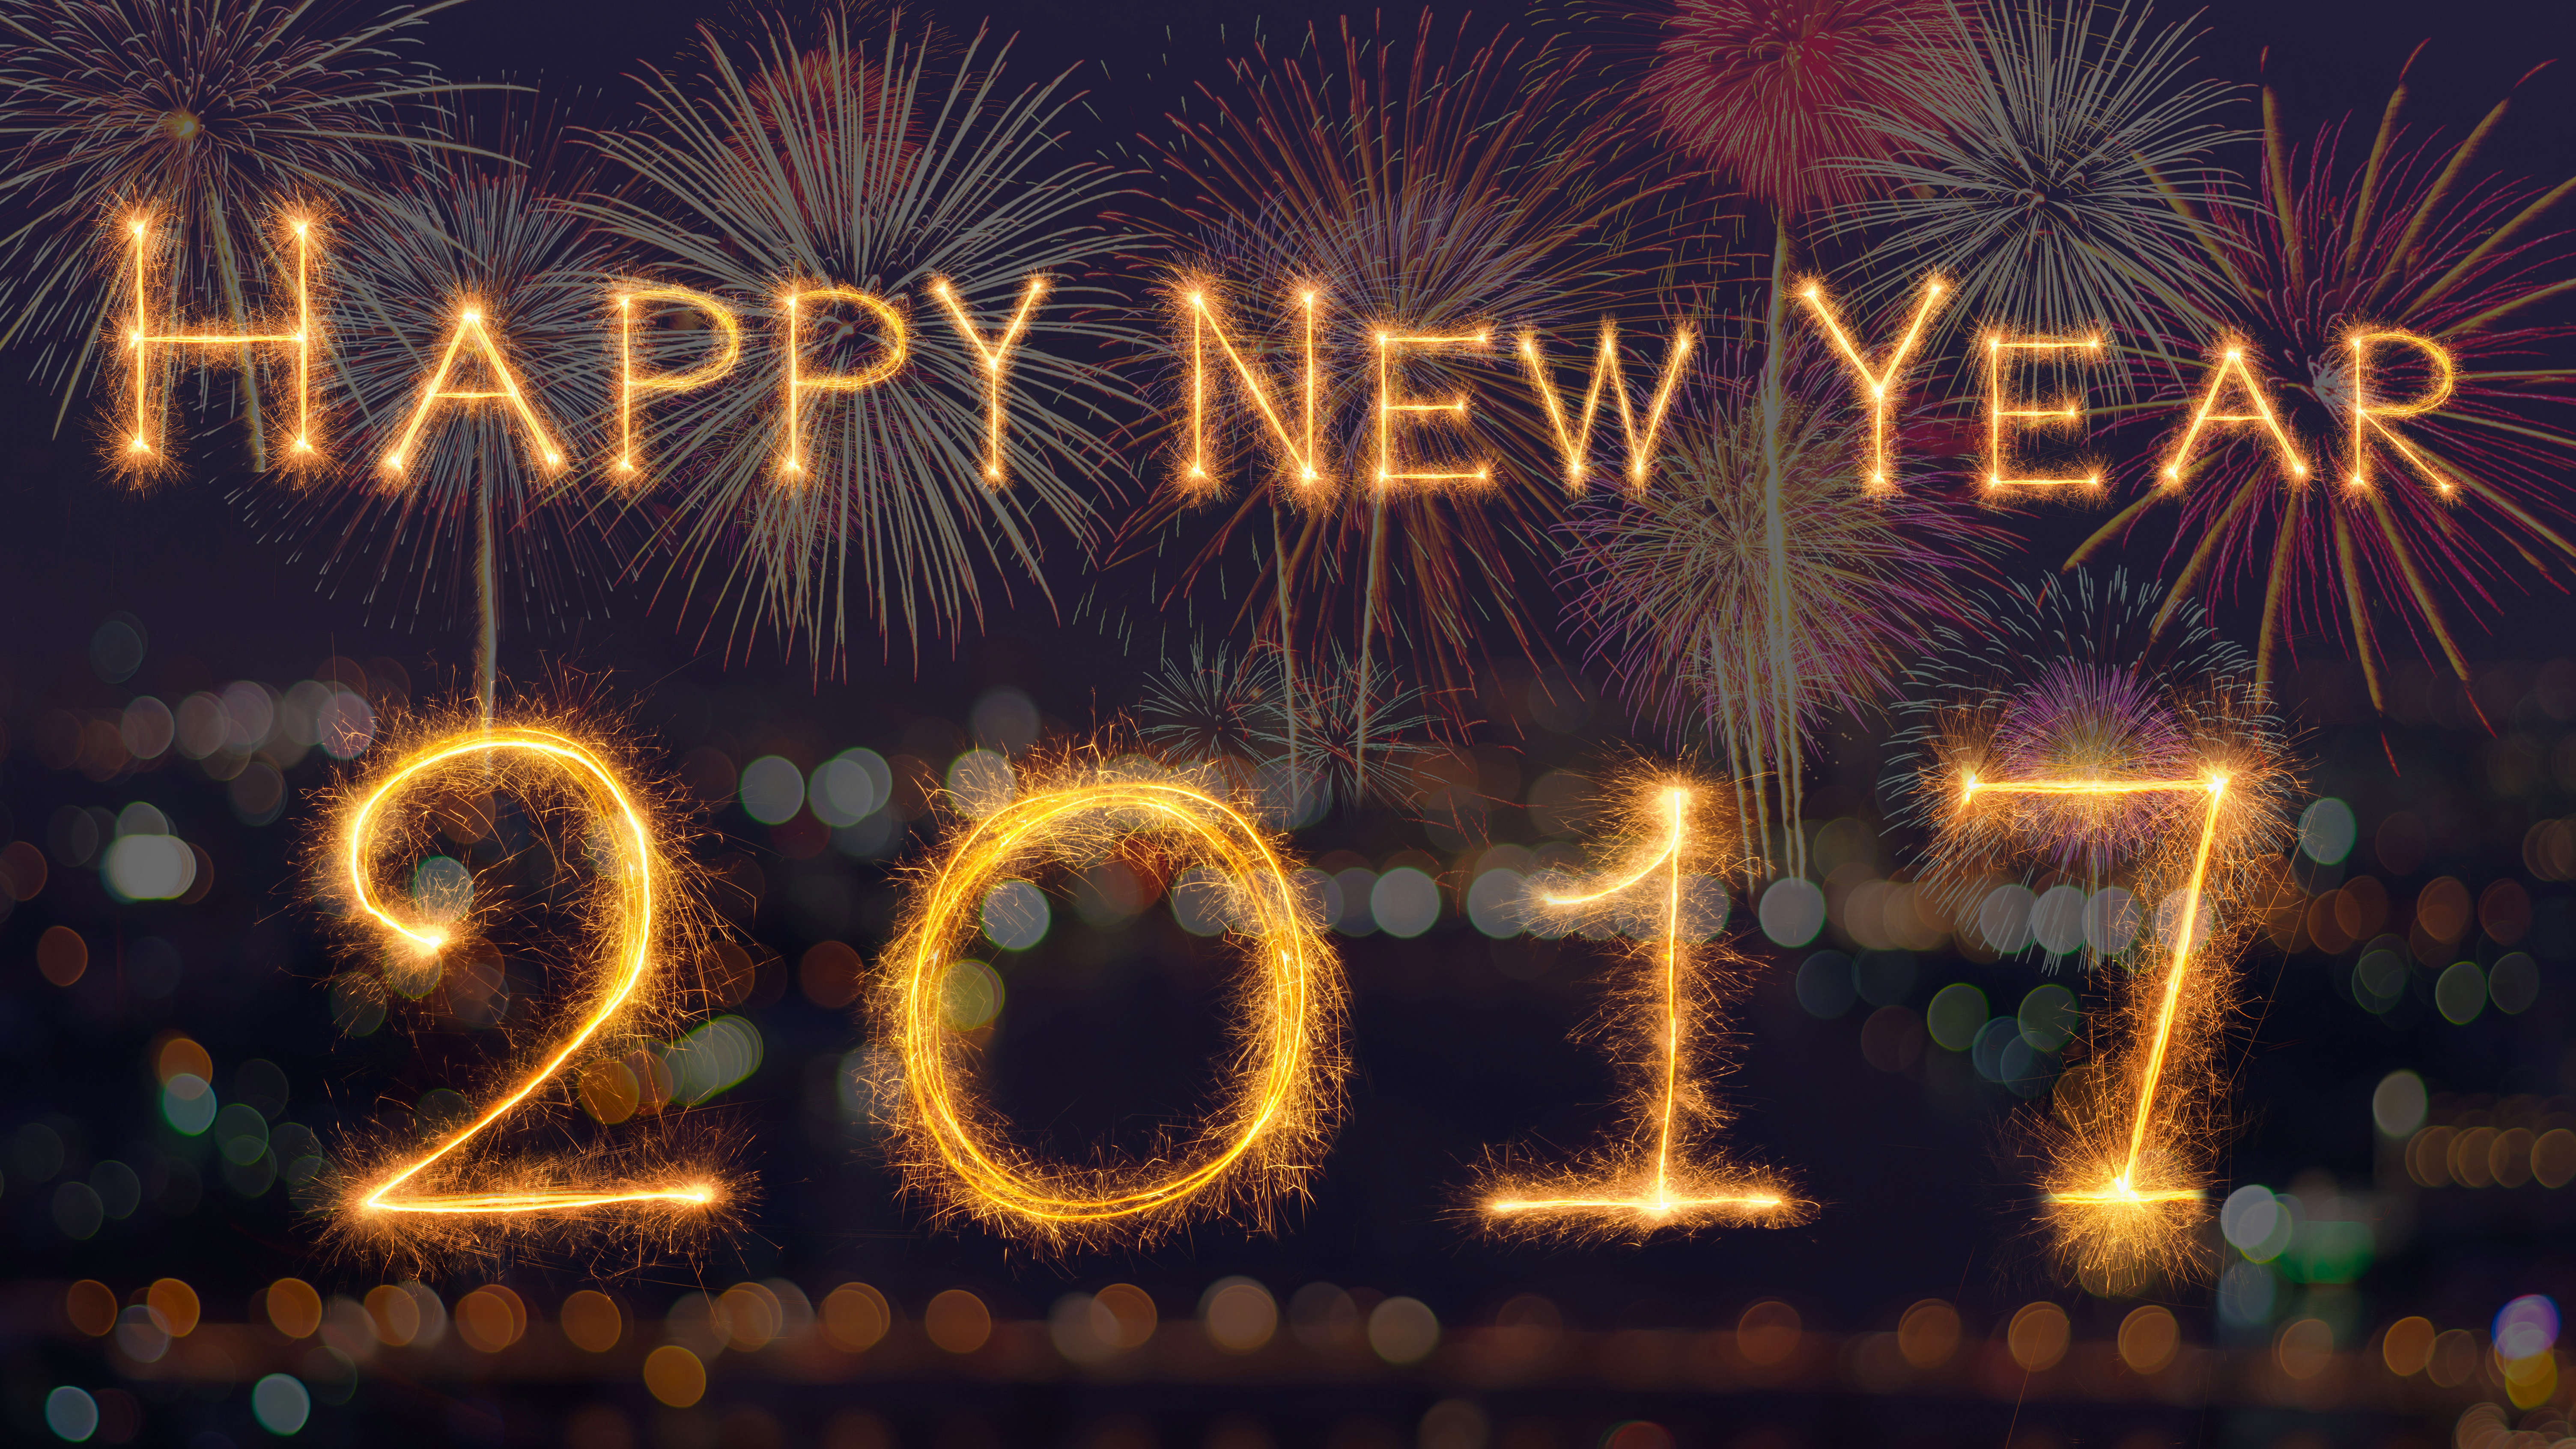 New Year 2017 5k Retina Ultra Hd Wallpaper Background Image